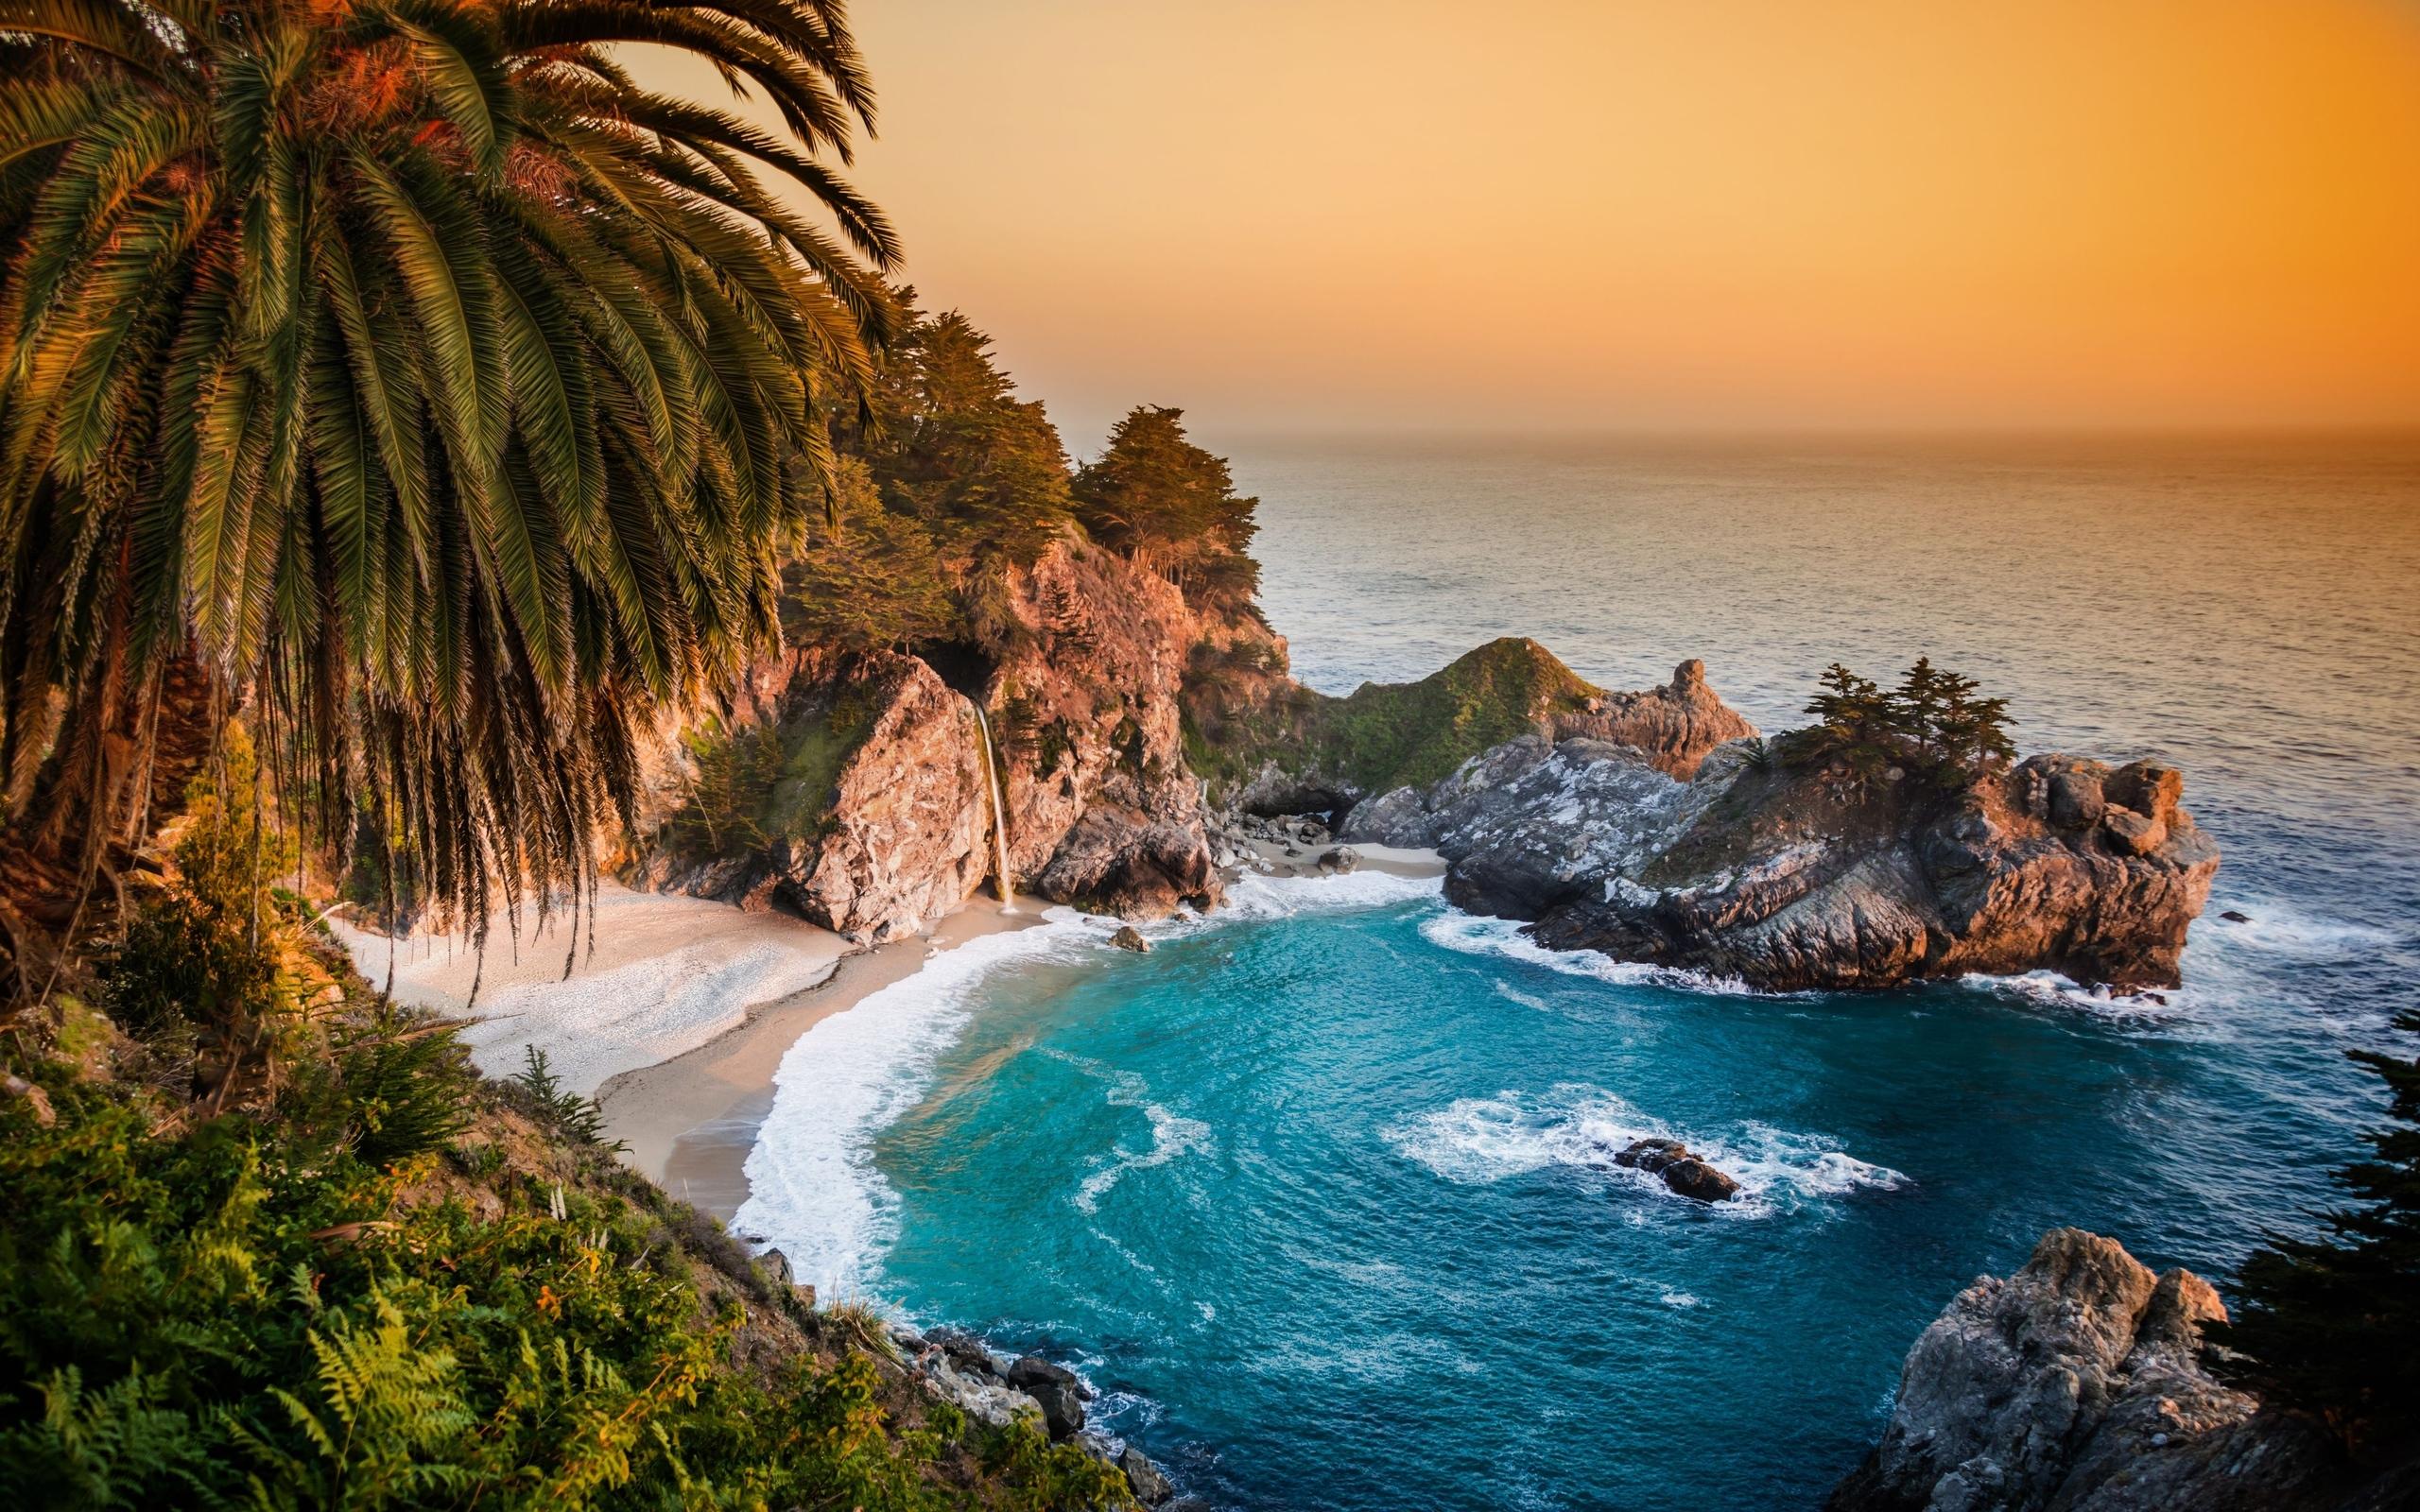 California Pacific Ocean 4K Ultra HD wallpaper 4k WallpaperNet 2560x1600